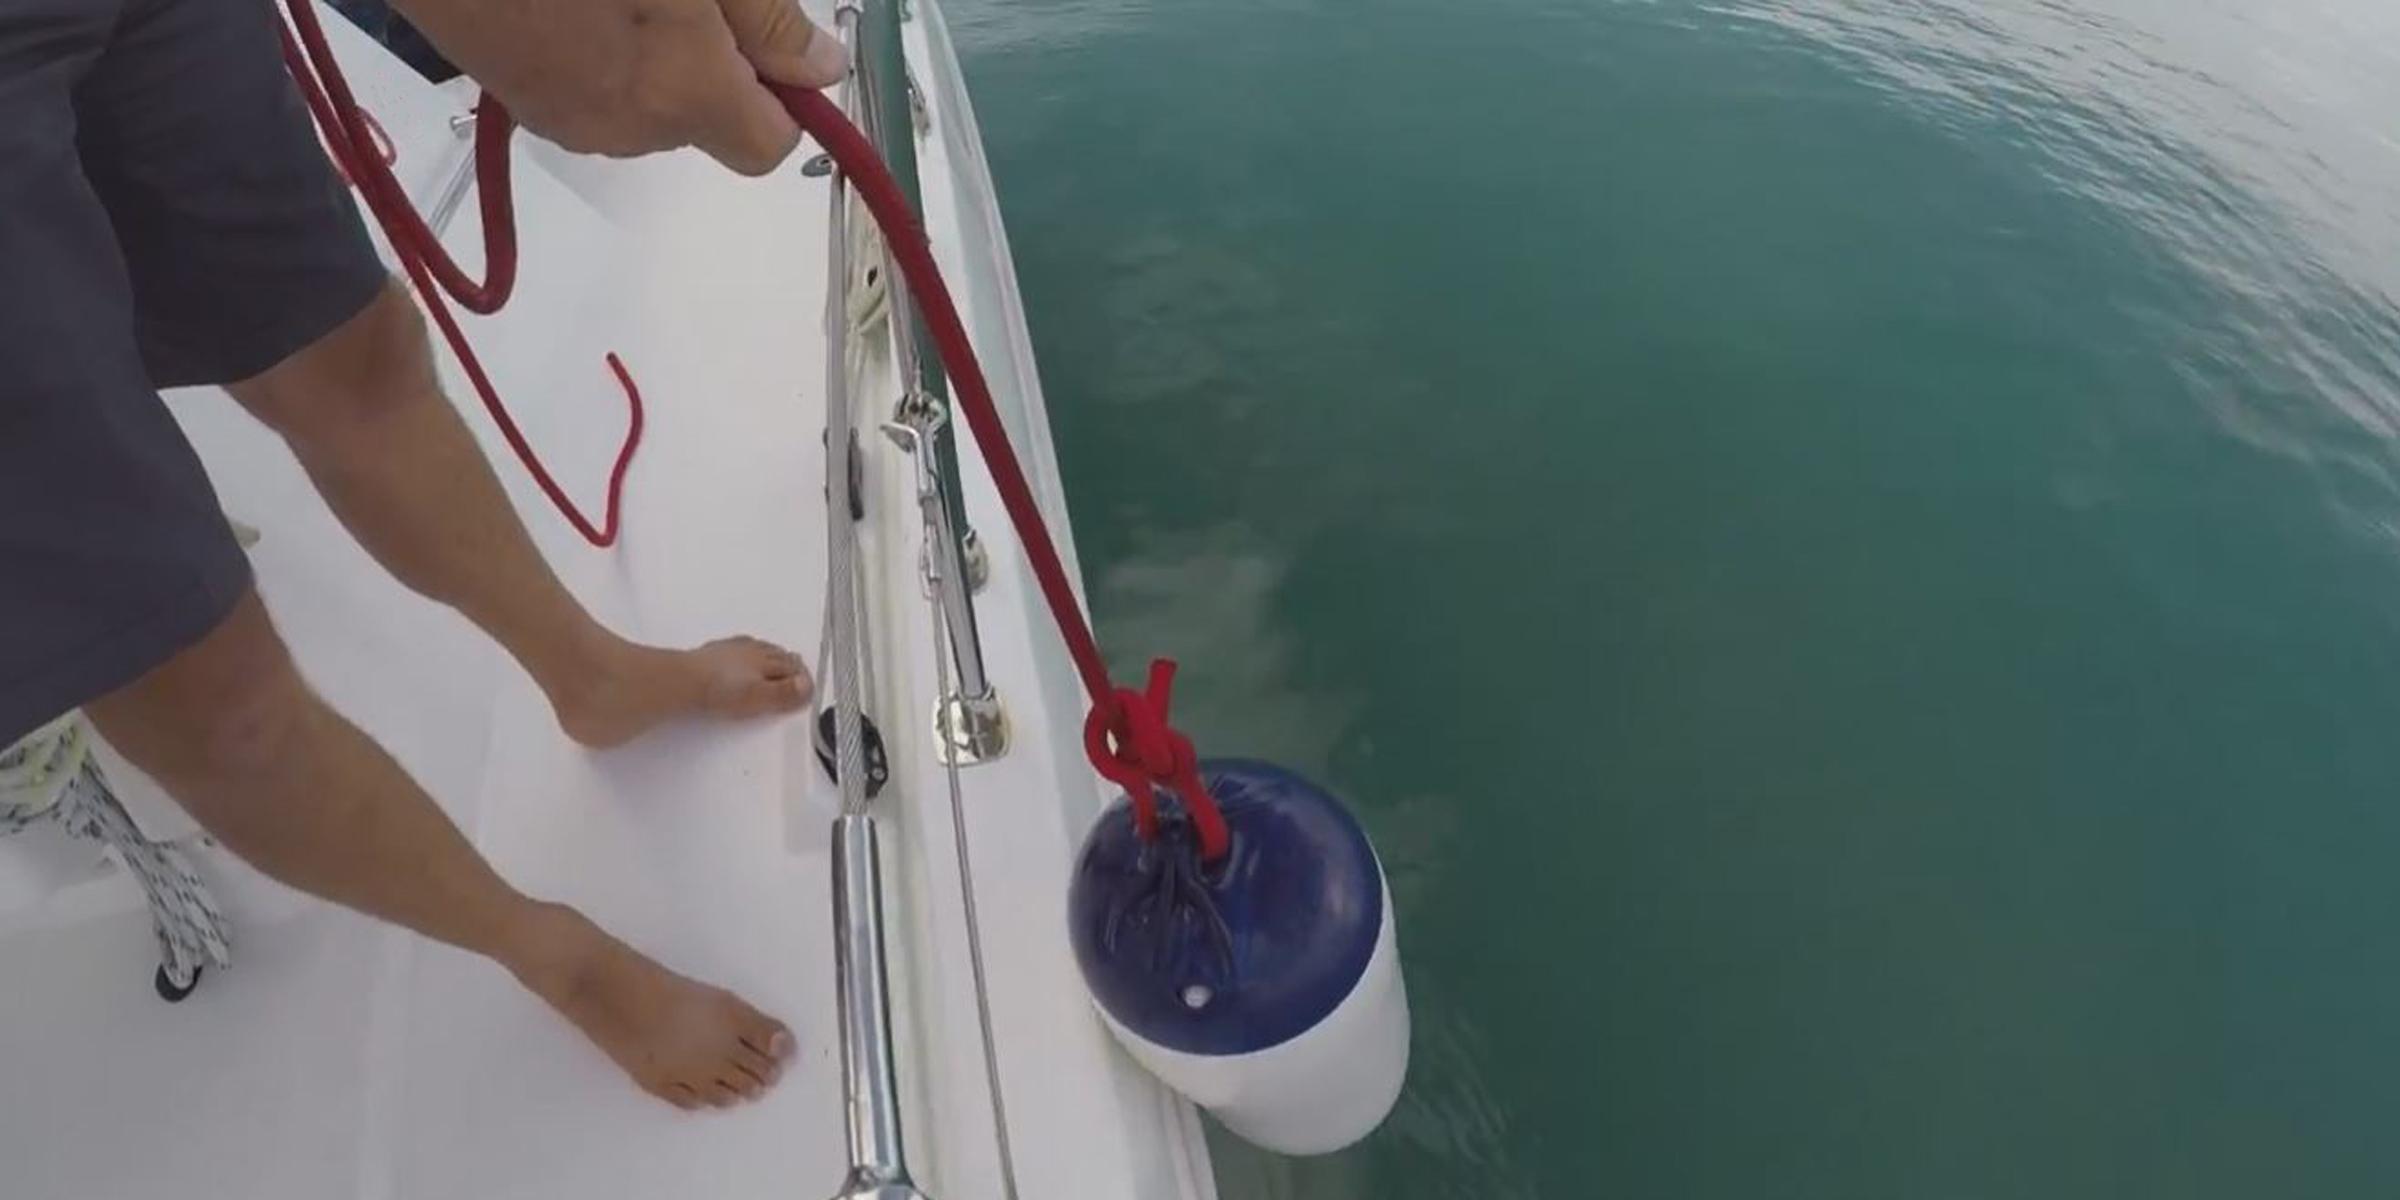 Skipper lowering fender